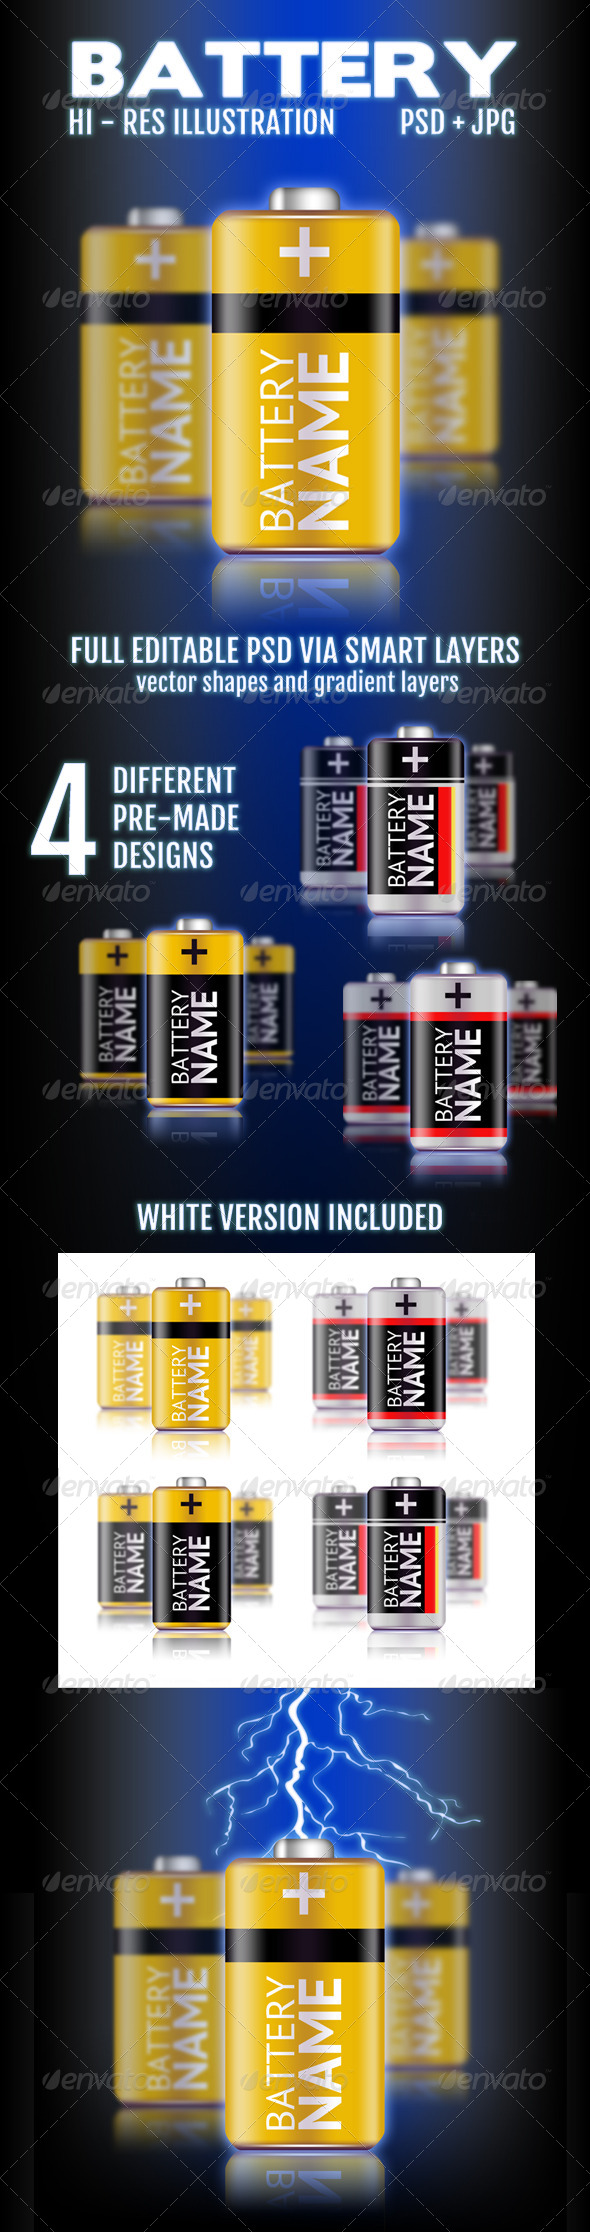 Battery Illustration - Objects Illustrations